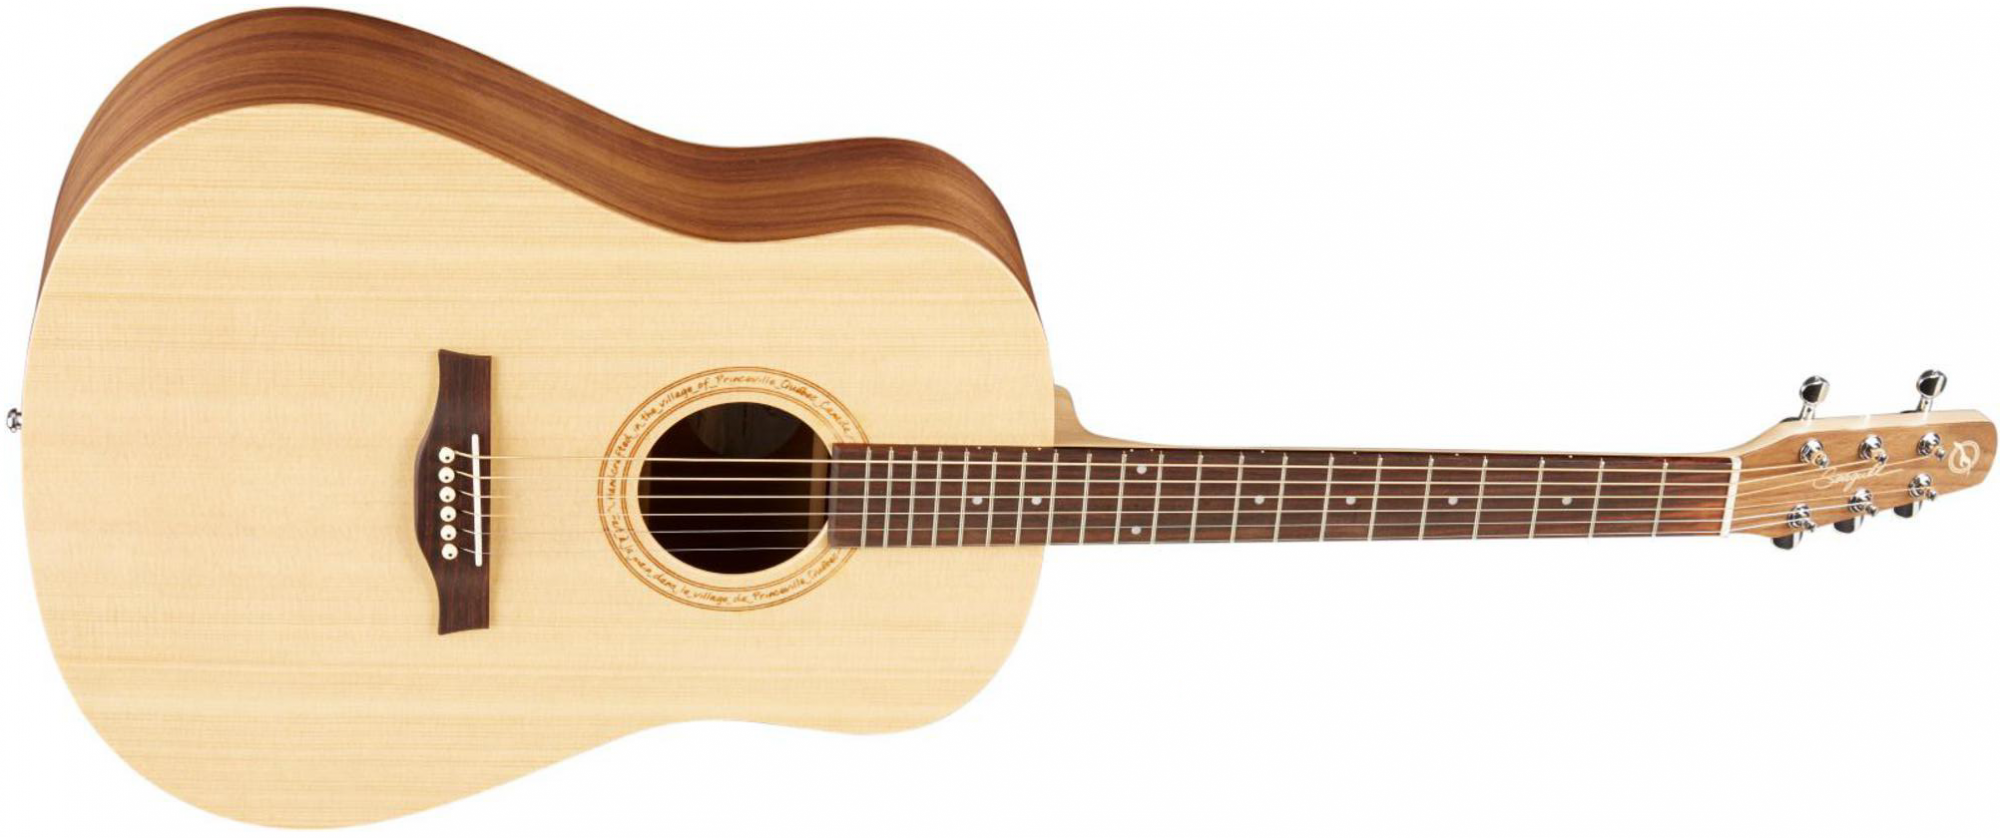 Seagull Excursion Walnut SG Acoustic Guitar